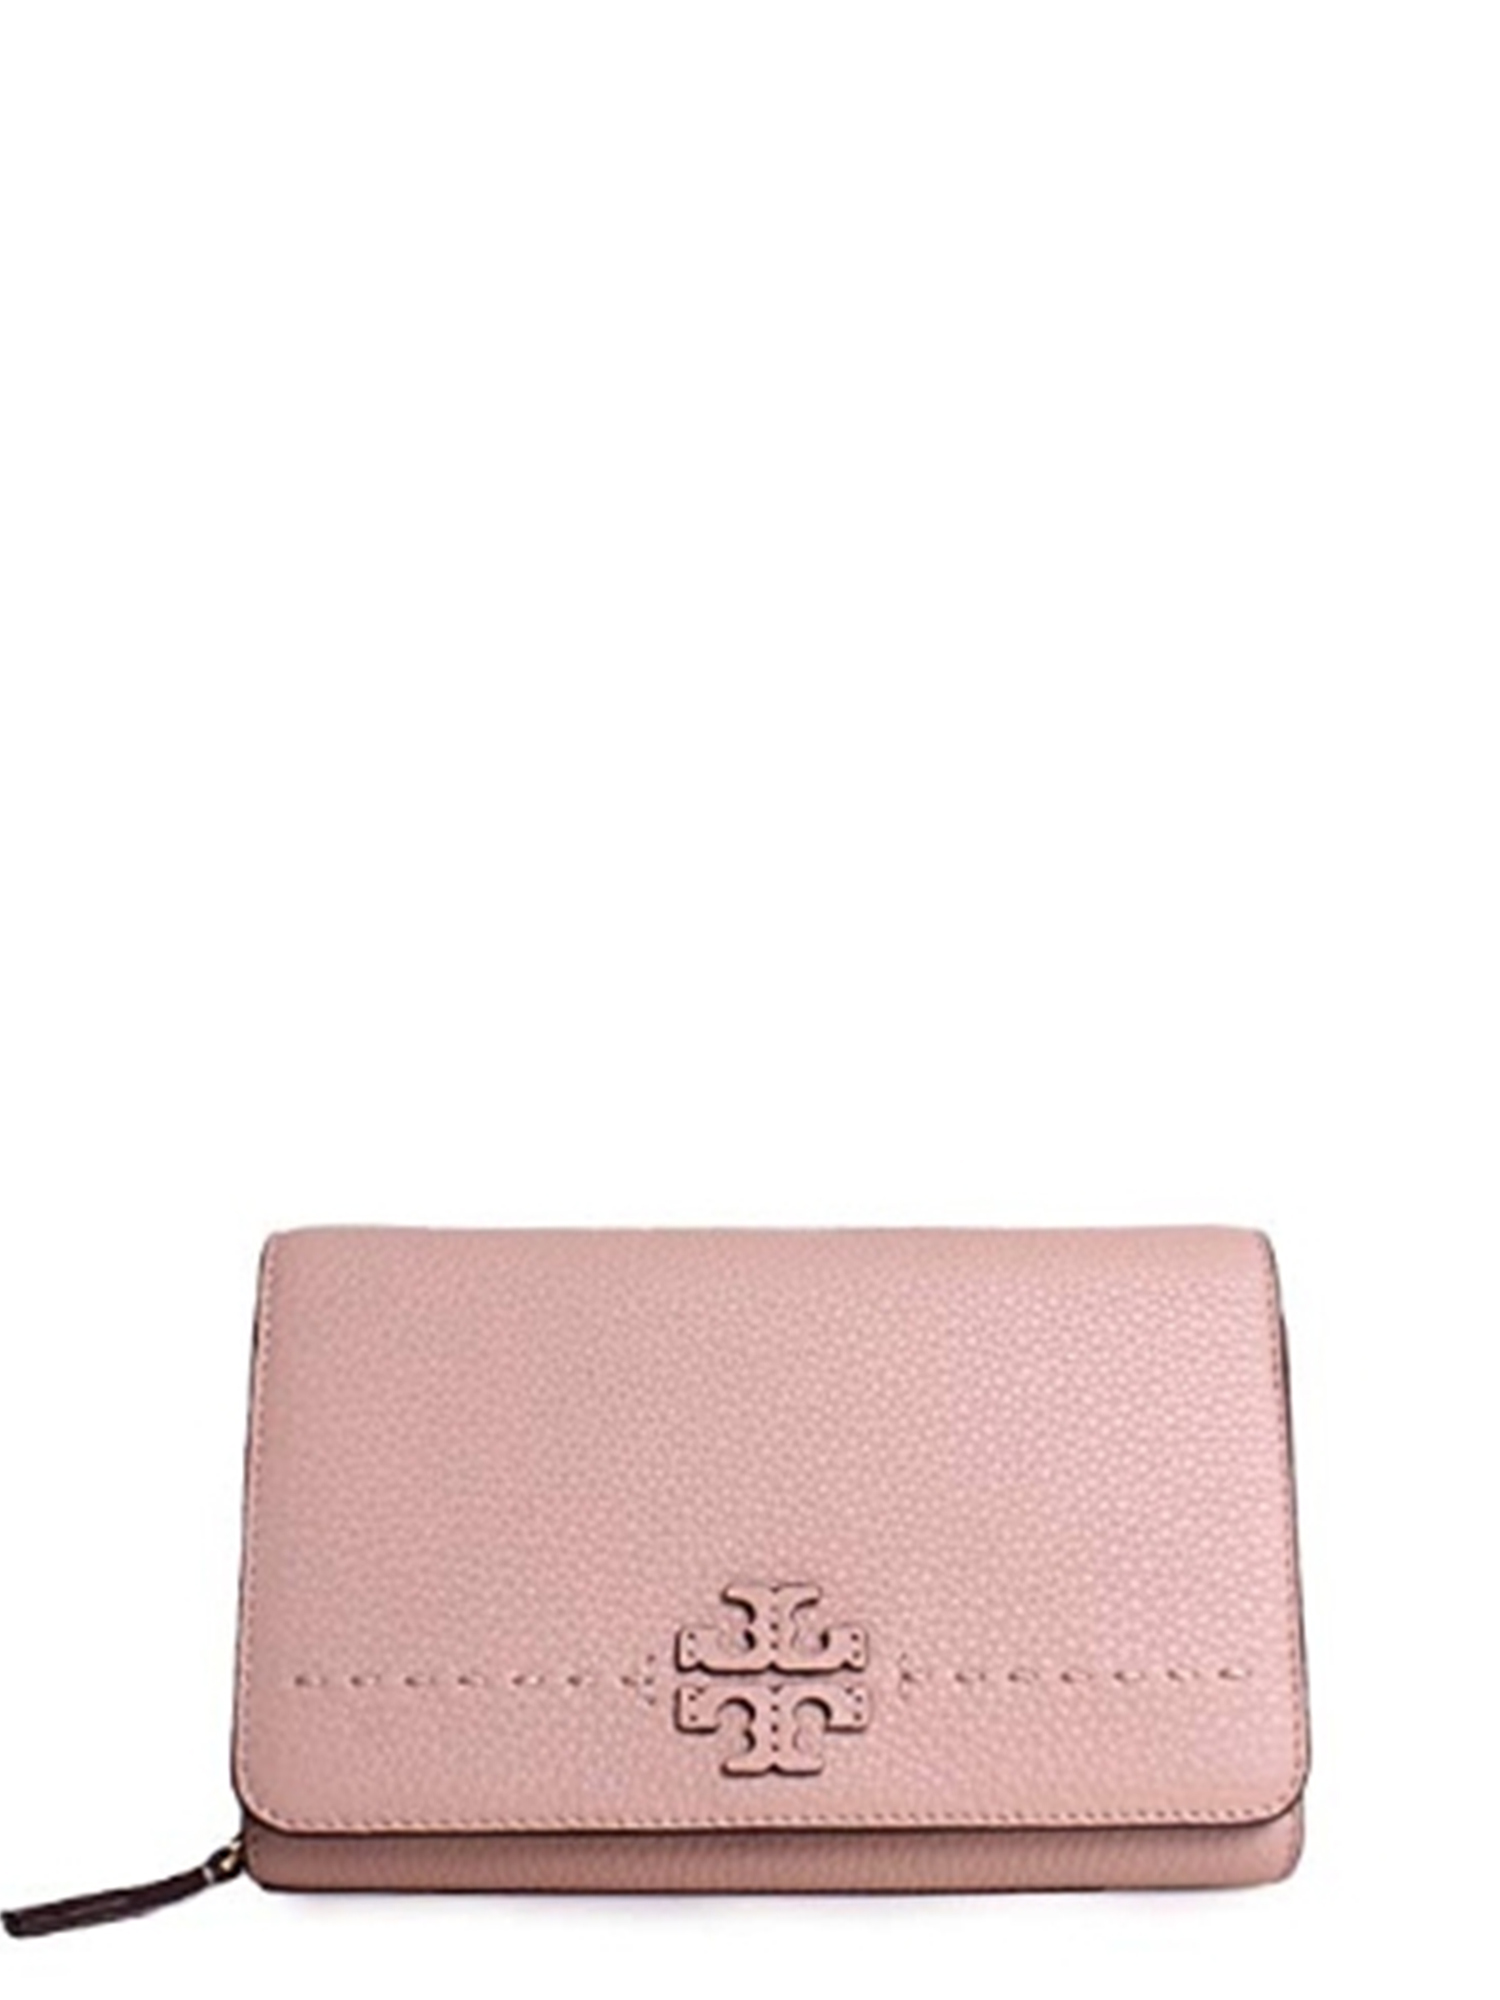 41c332853966cd ... discount code for tory burch mcgraw flat wallet crossbody purse one  size devon sand d71bc b2435